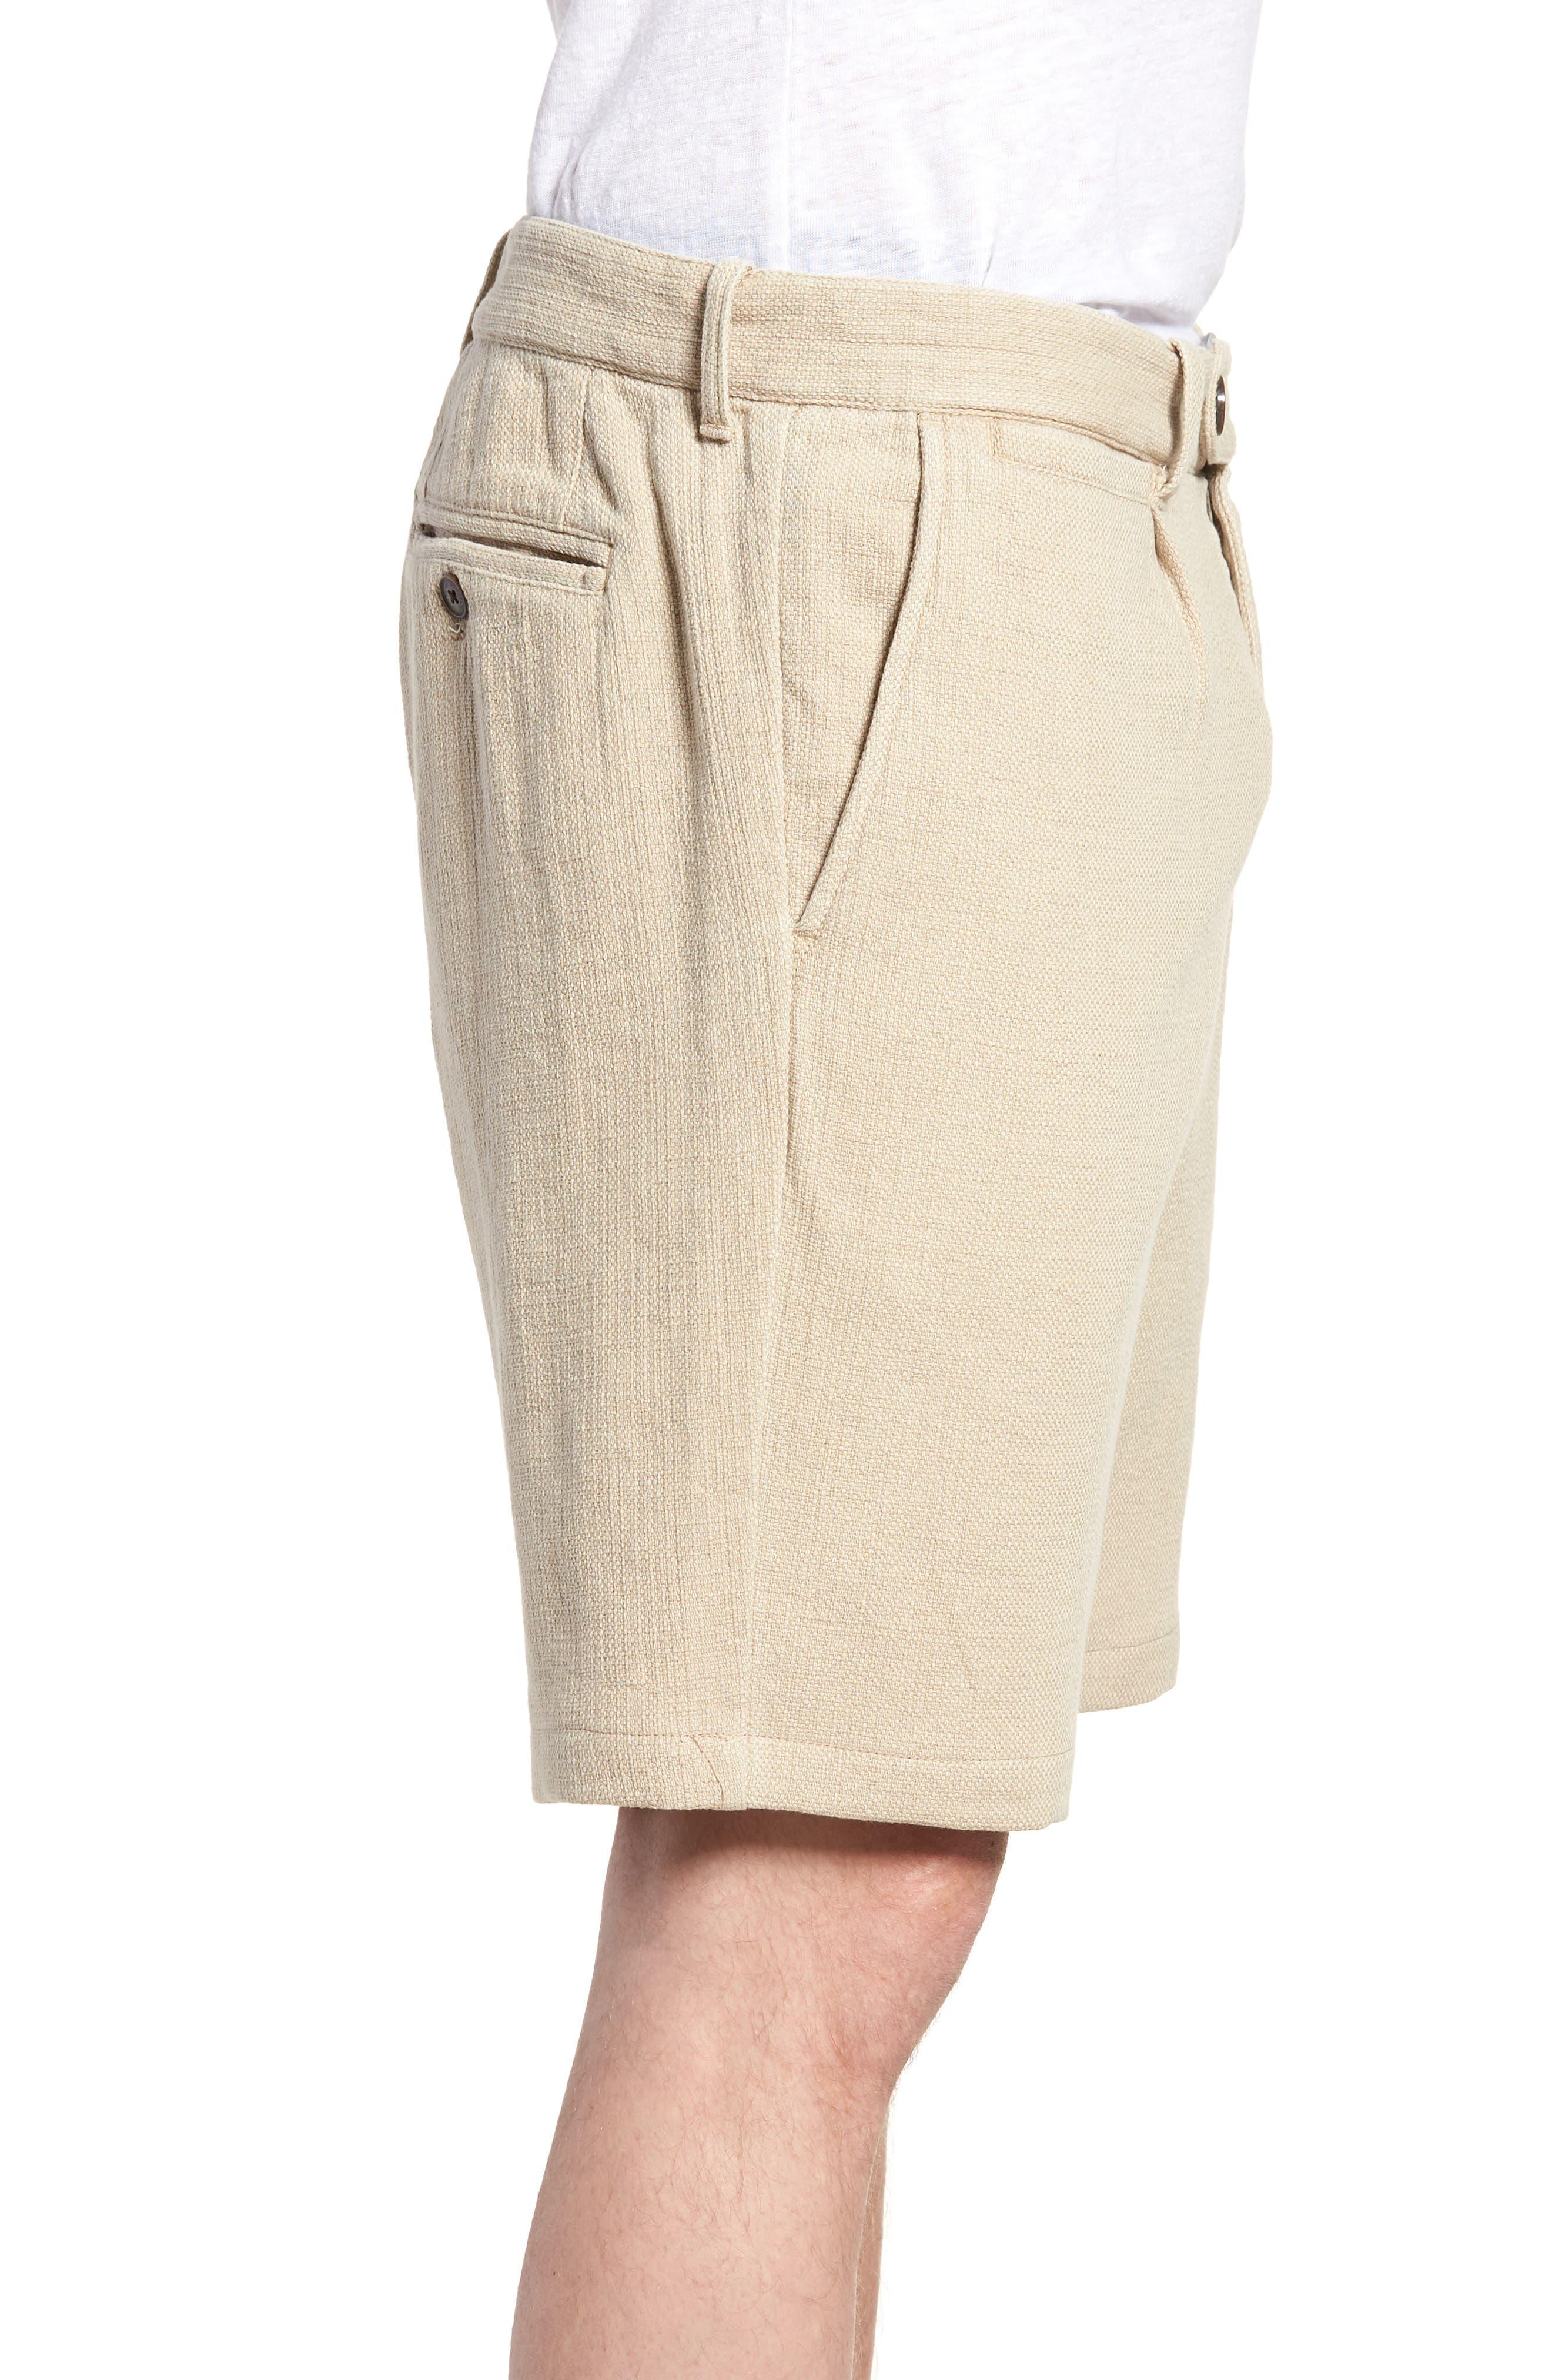 Thomas Regular Fit Pleated Shorts,                             Alternate thumbnail 3, color,                             Tan